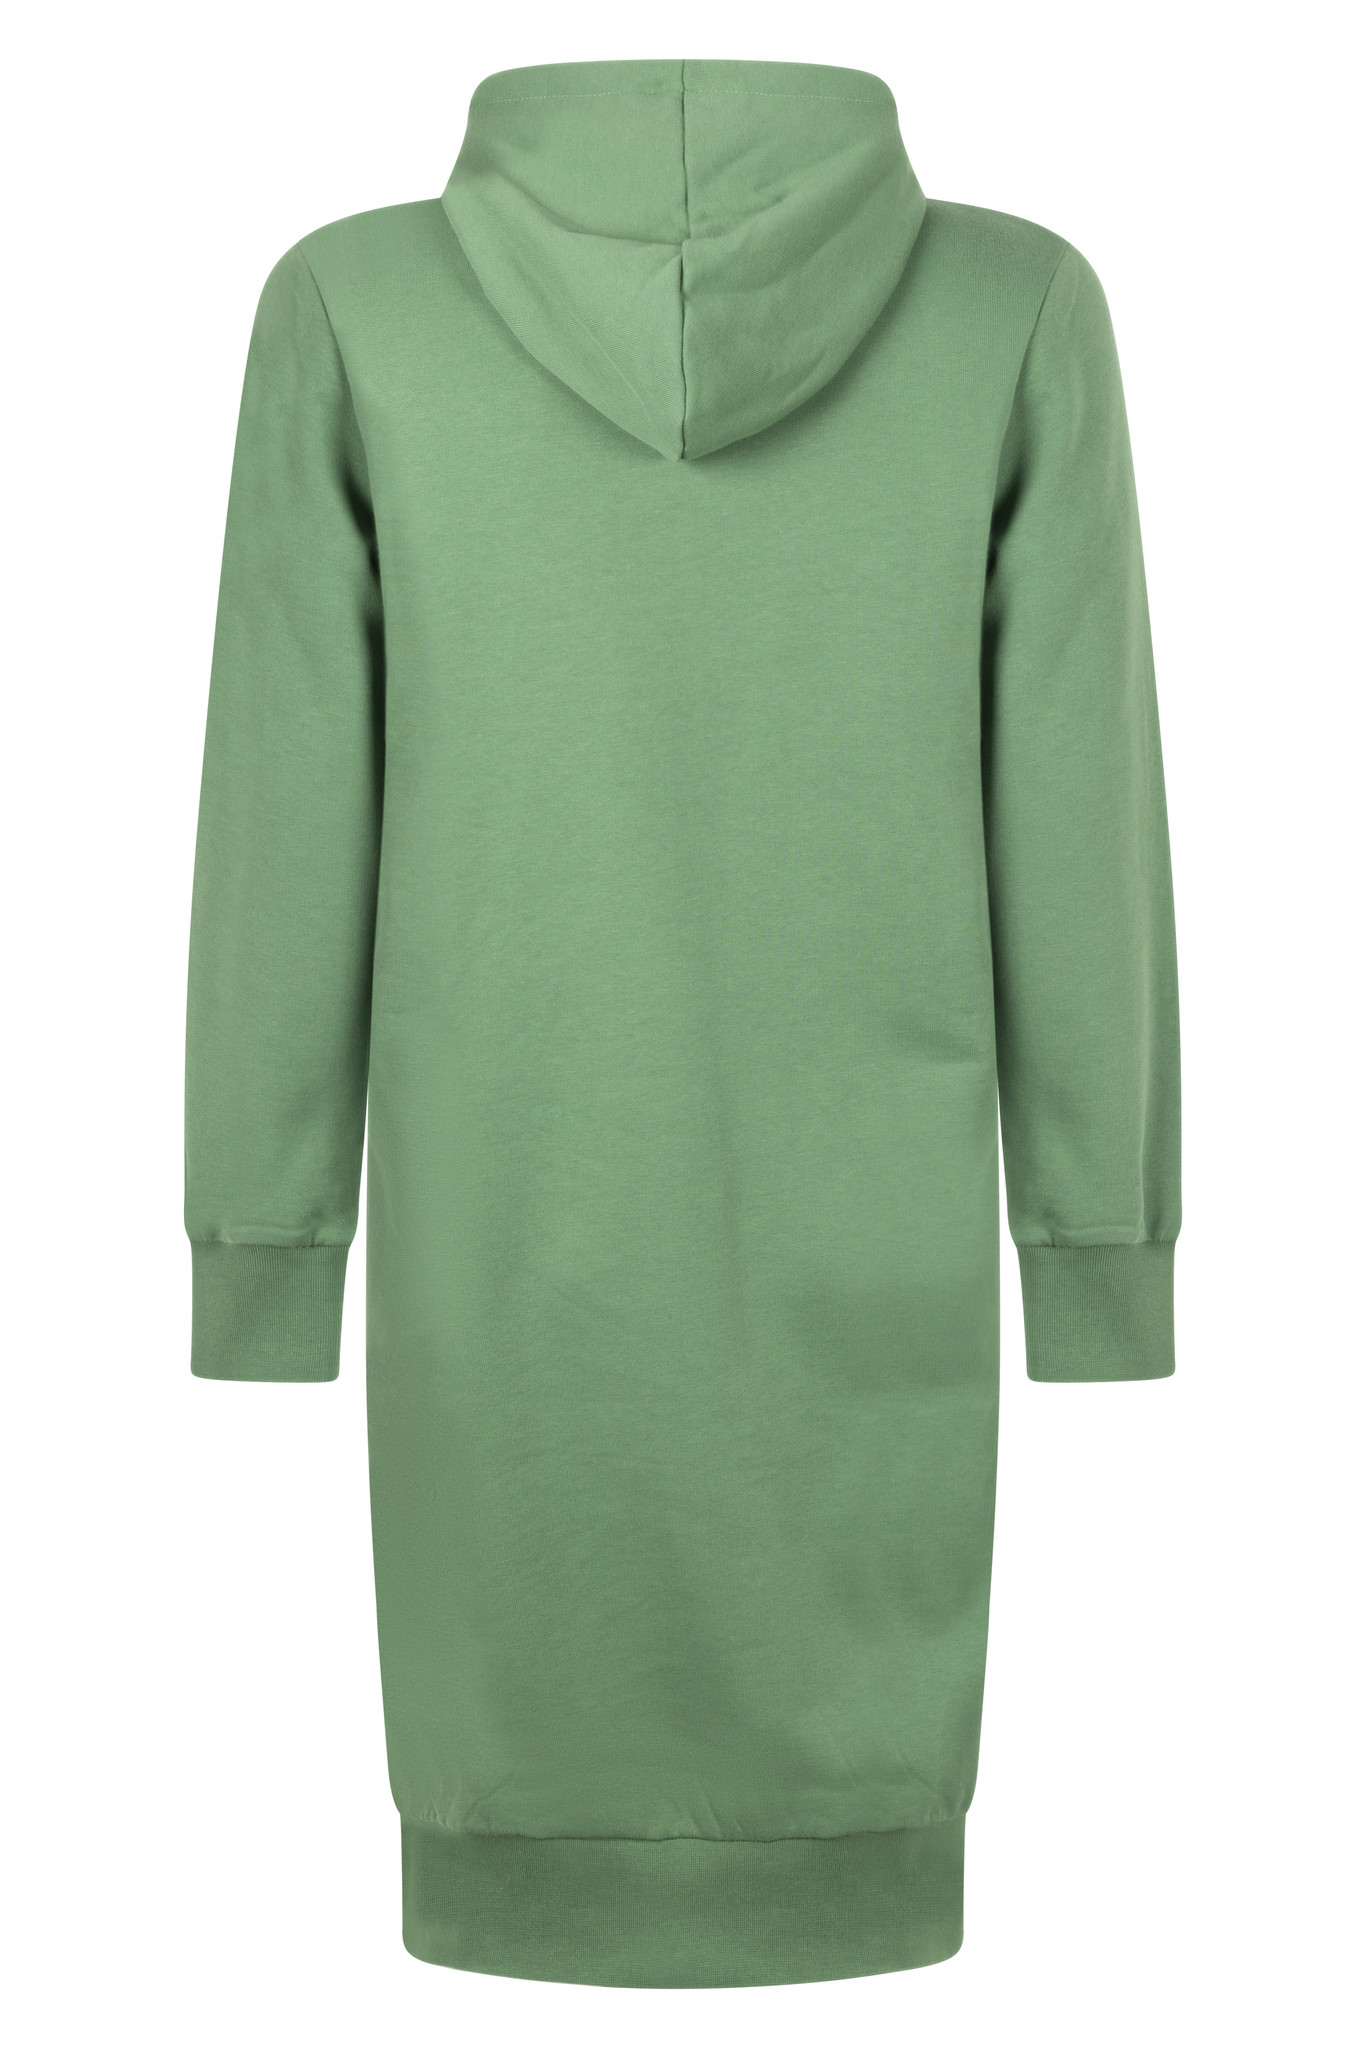 Zoso Zoso 215 Pepper Hoode sweat dress